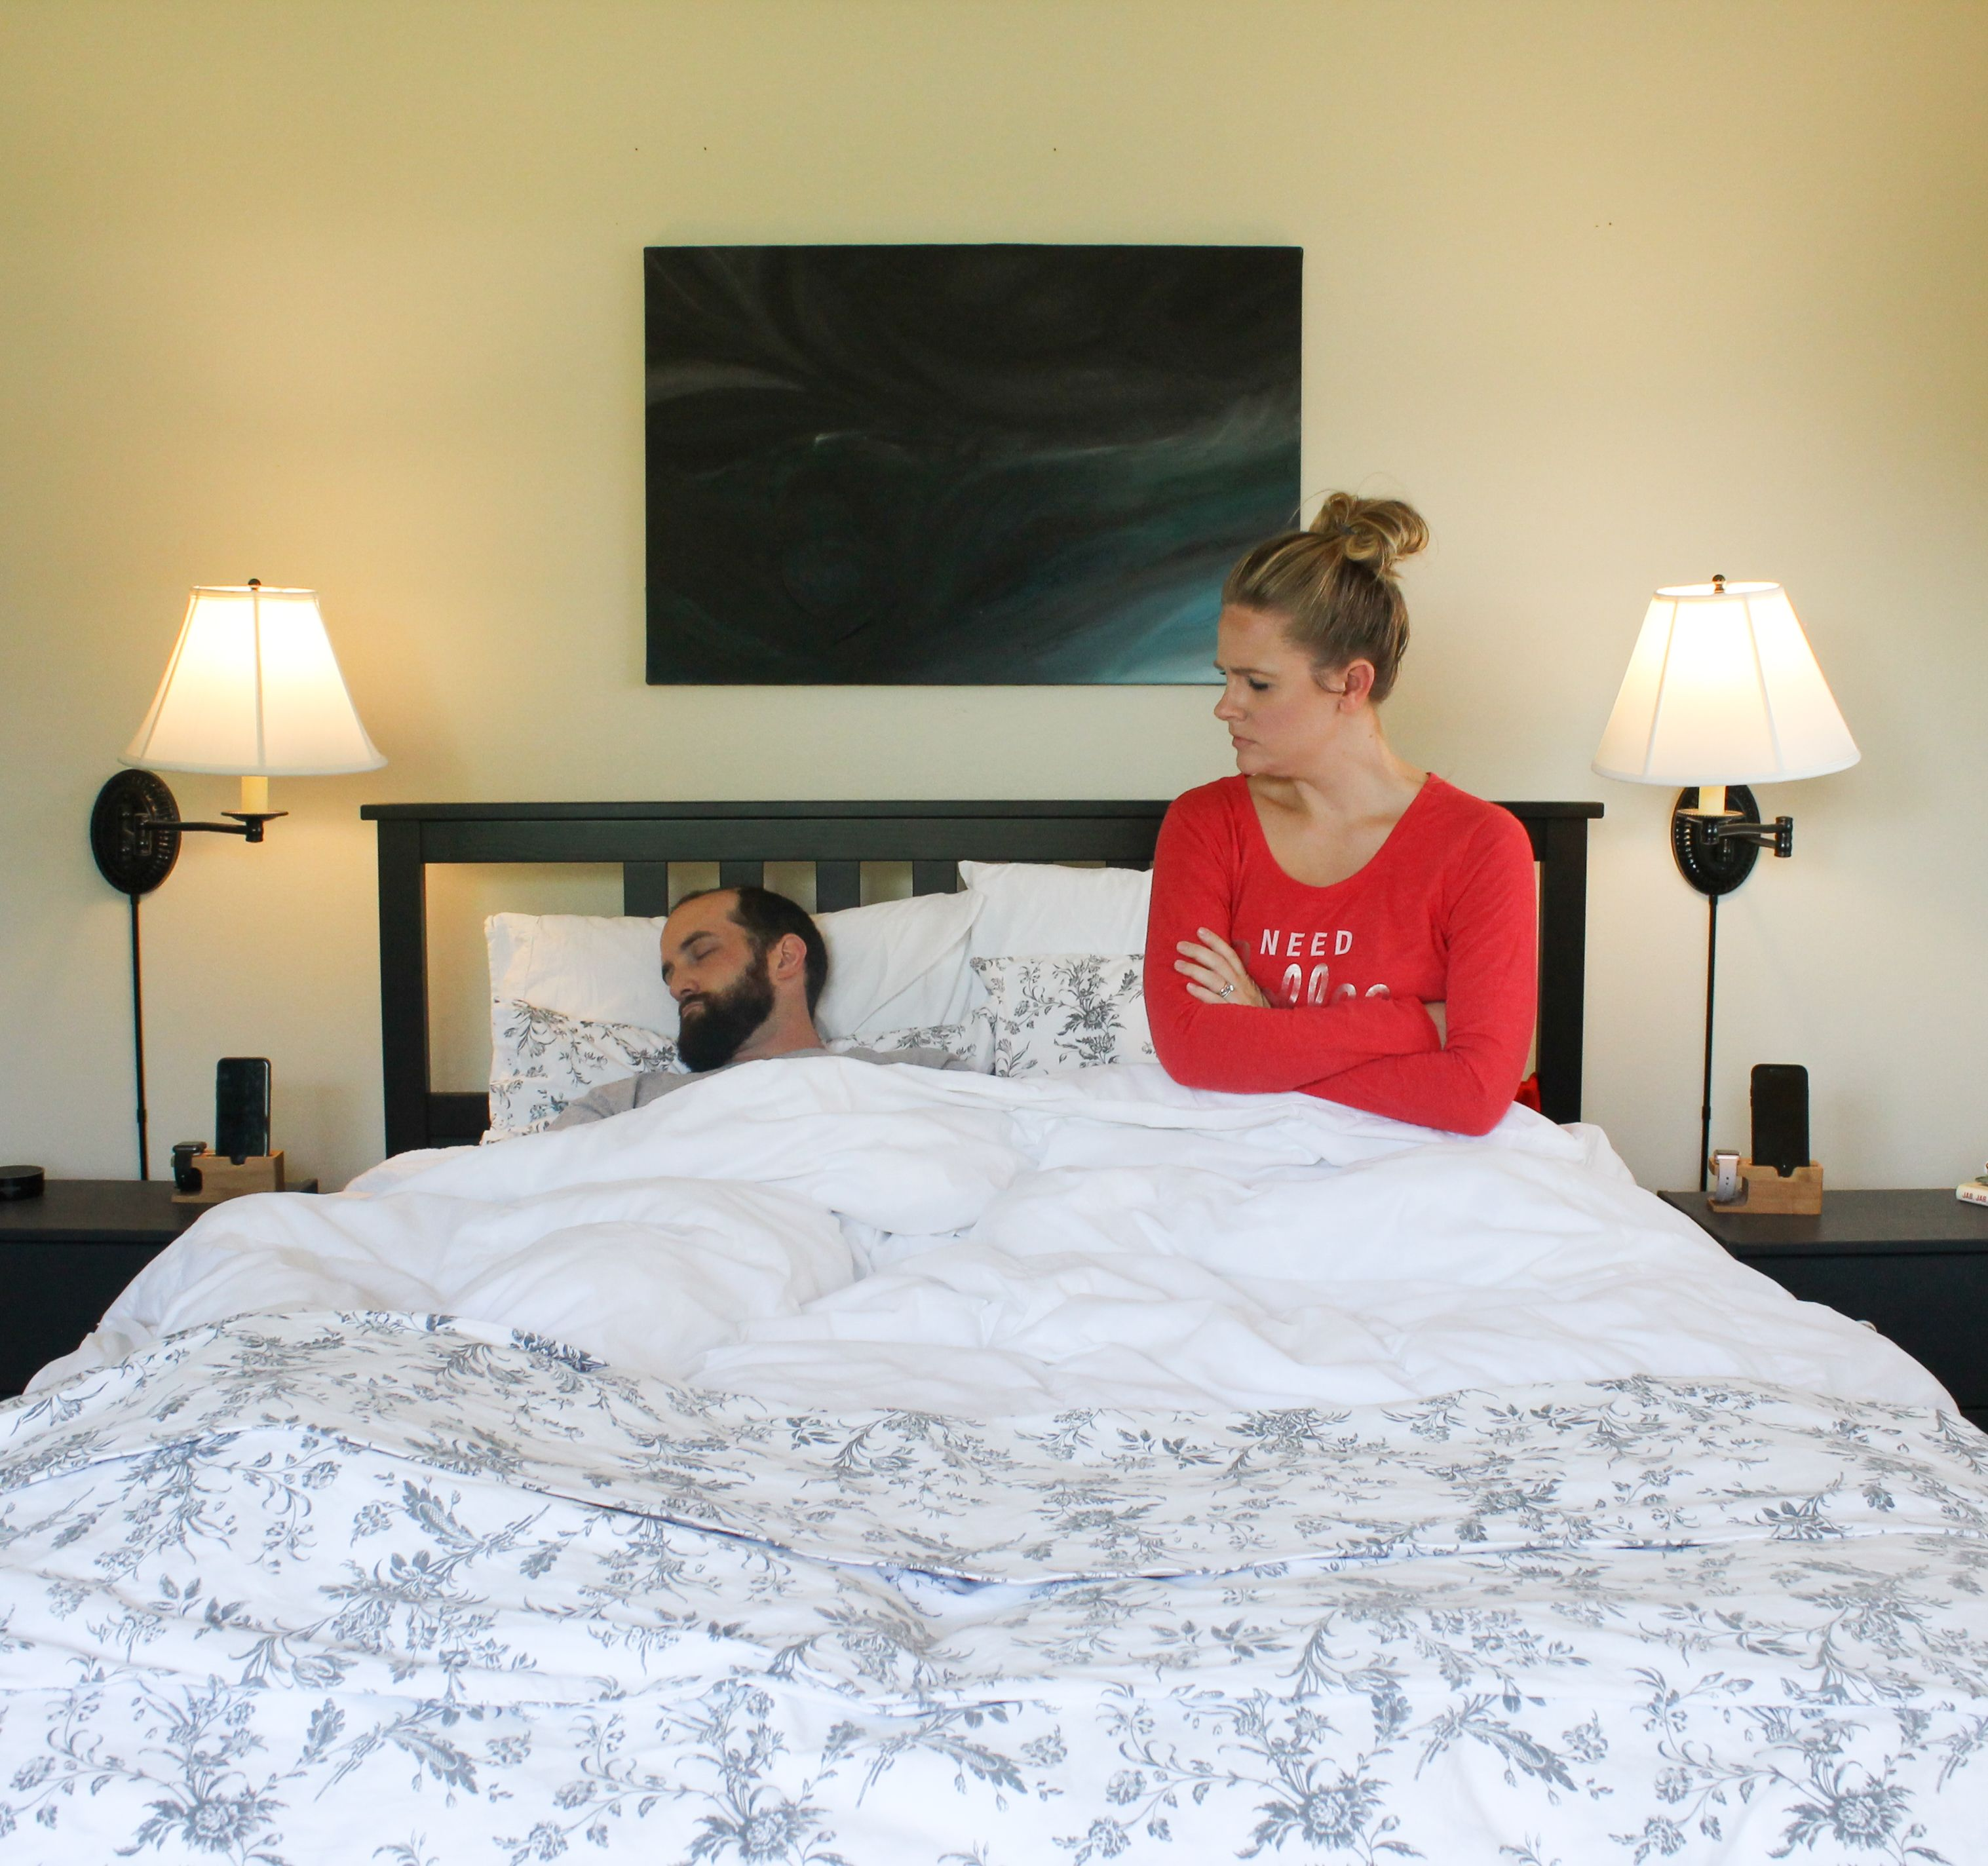 Intimacy in the bedroom